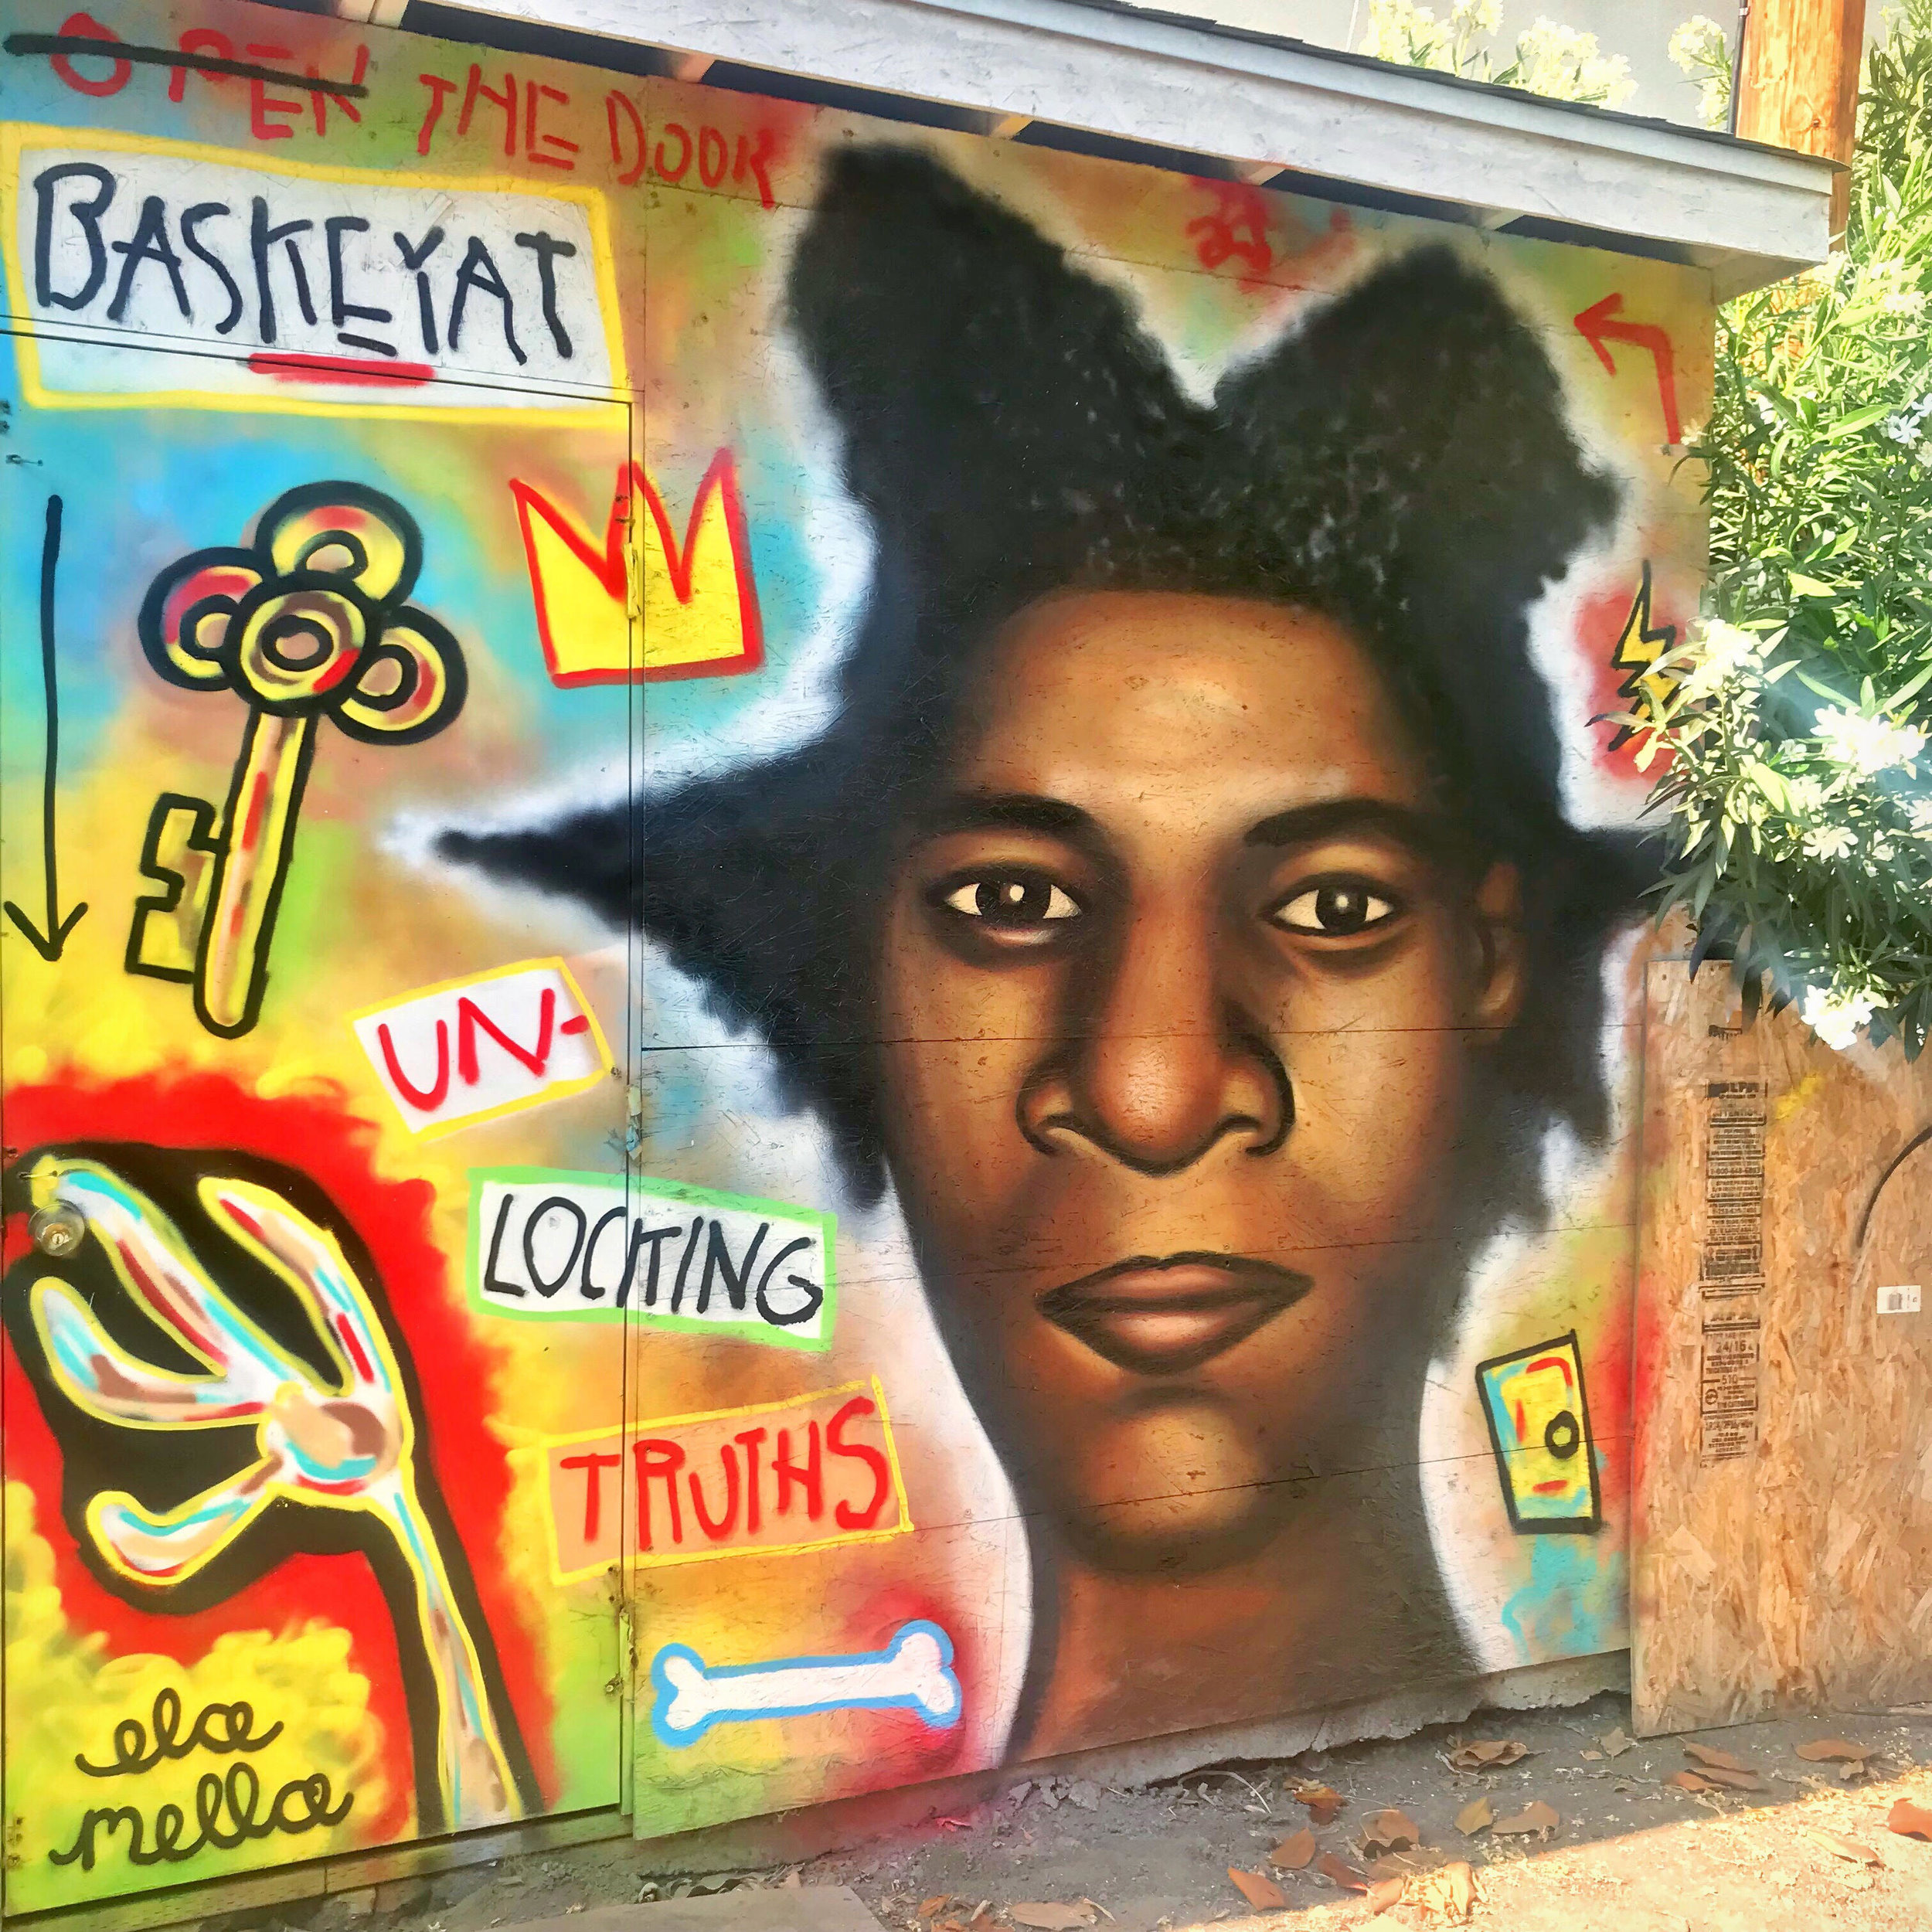 Baskeyat - Los Angeles, California2018